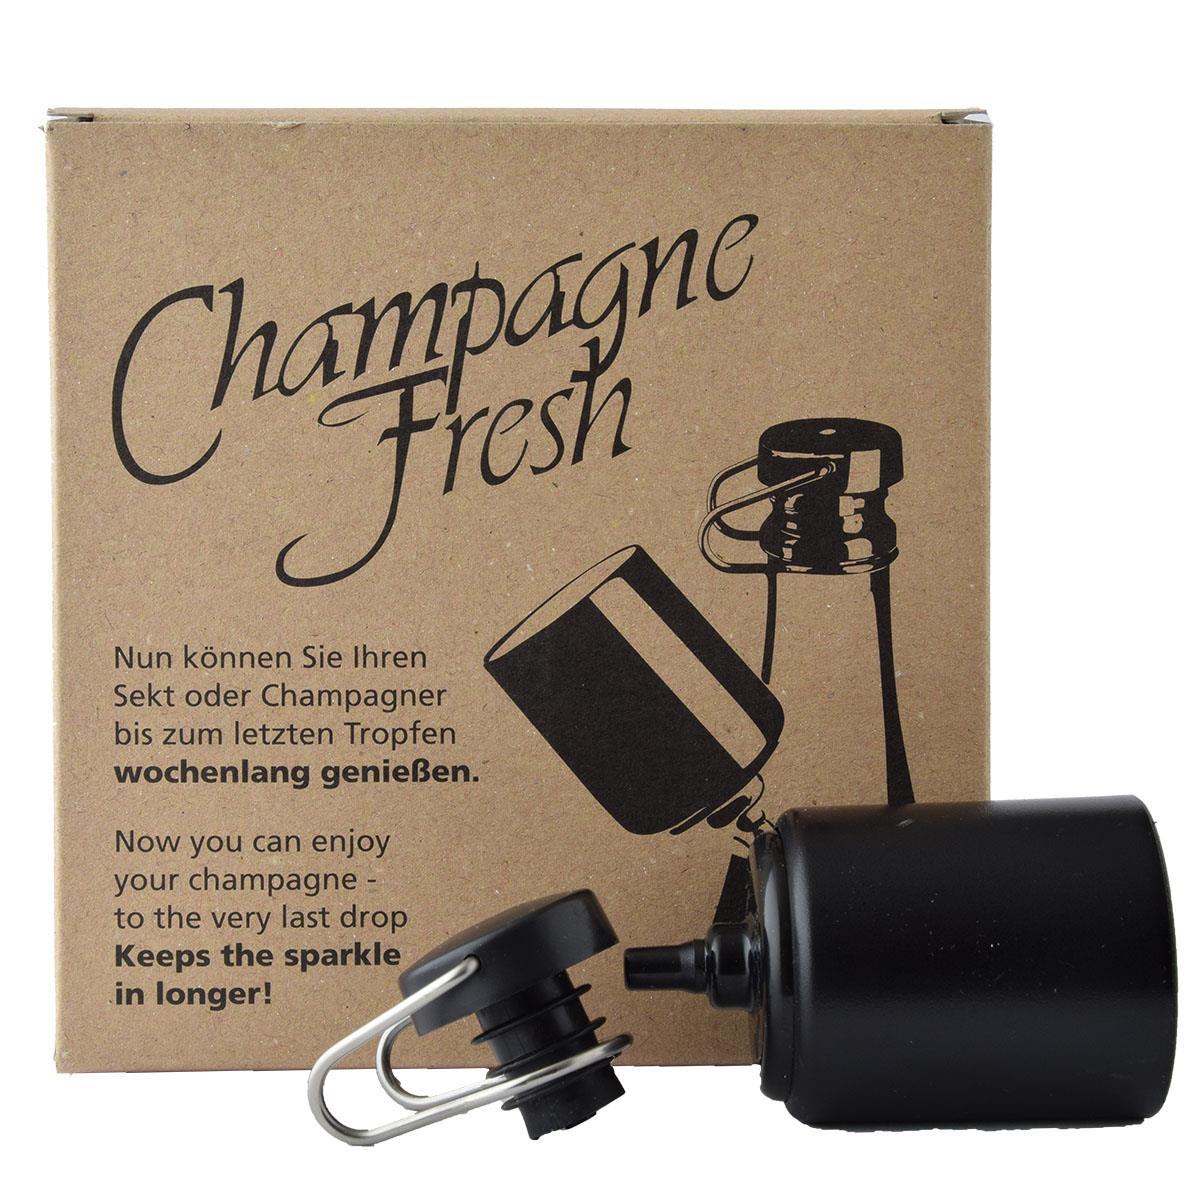 Champagne Fresh